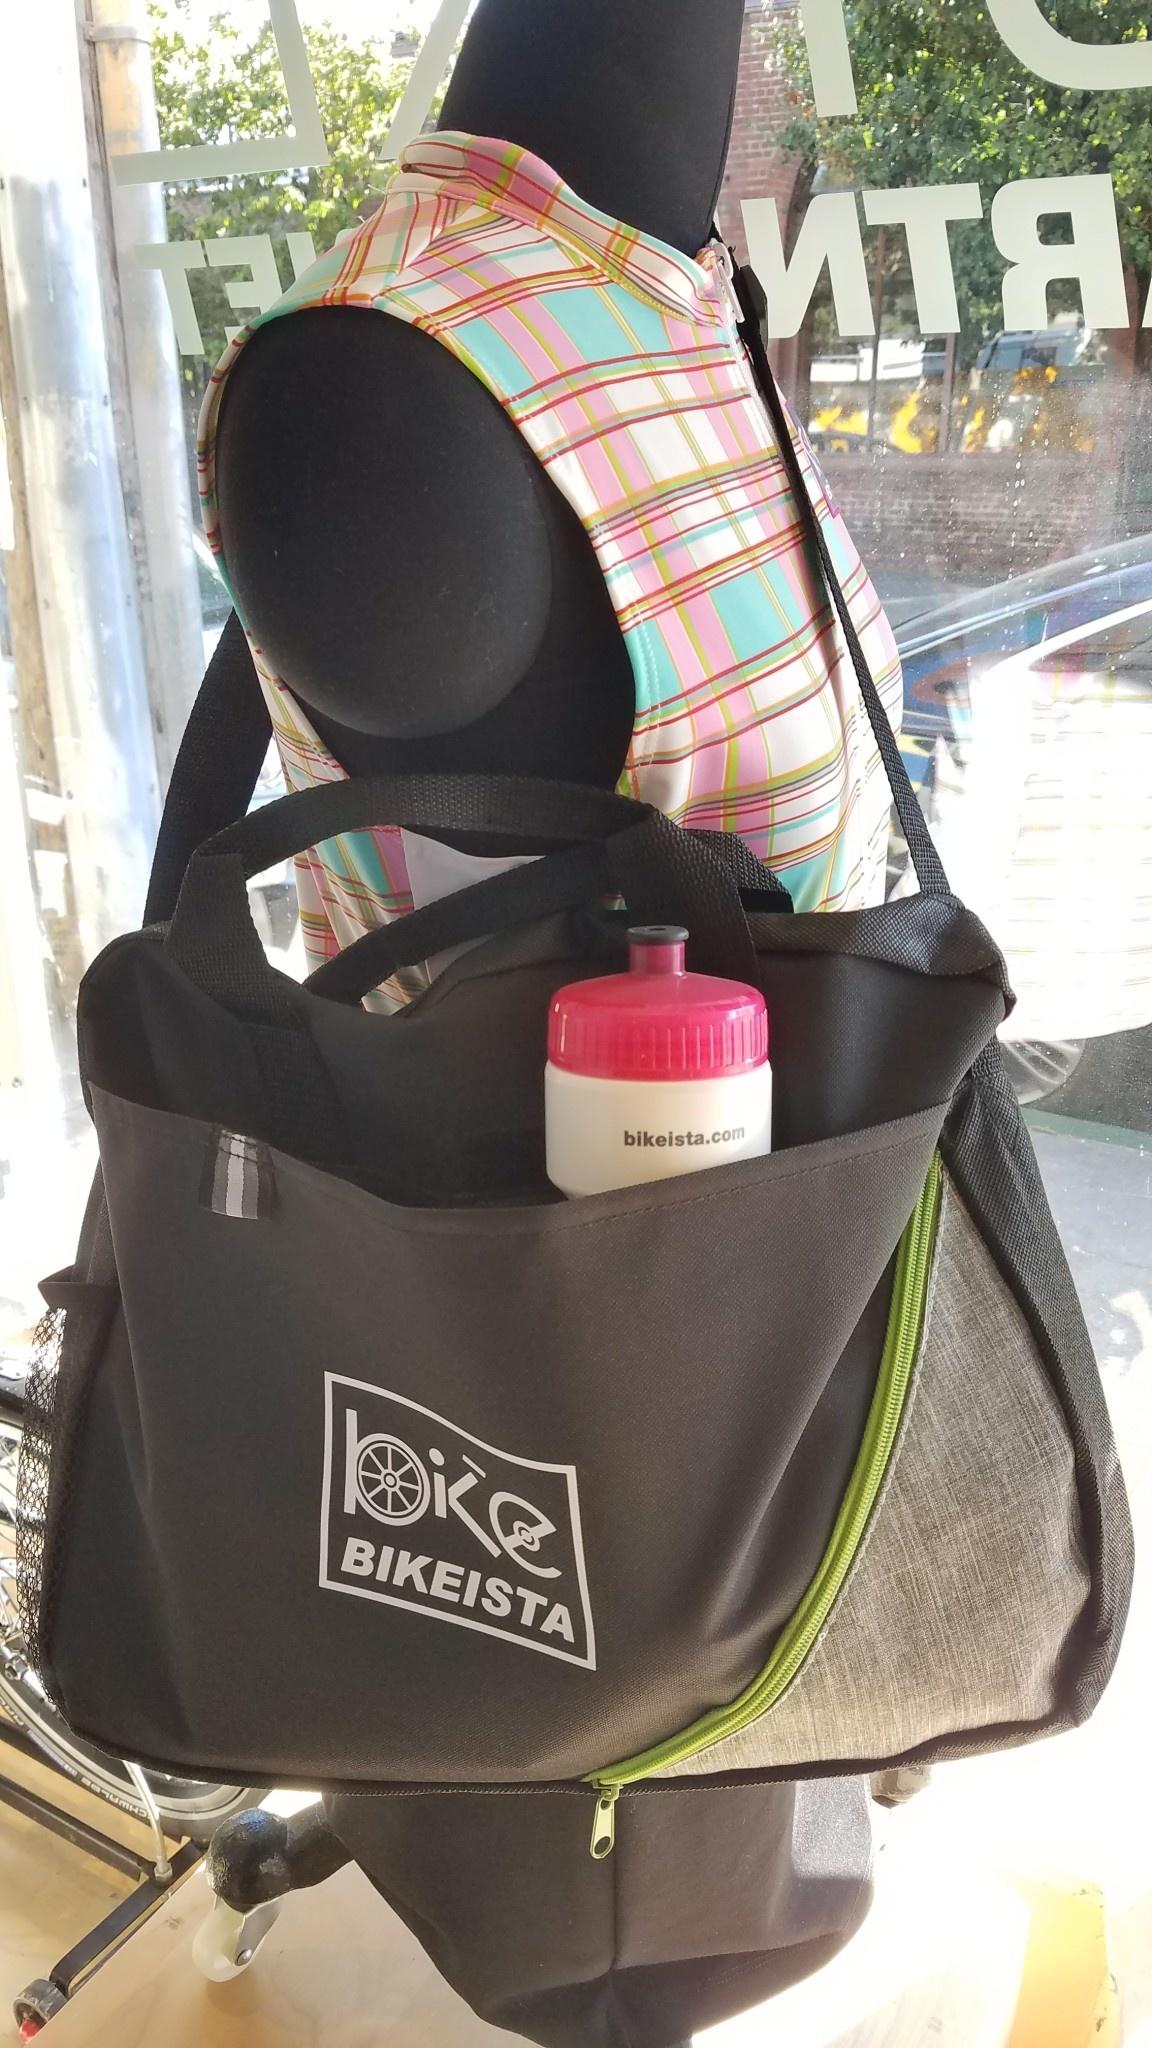 BikeIsta BIKEISTA Bags (Variety)